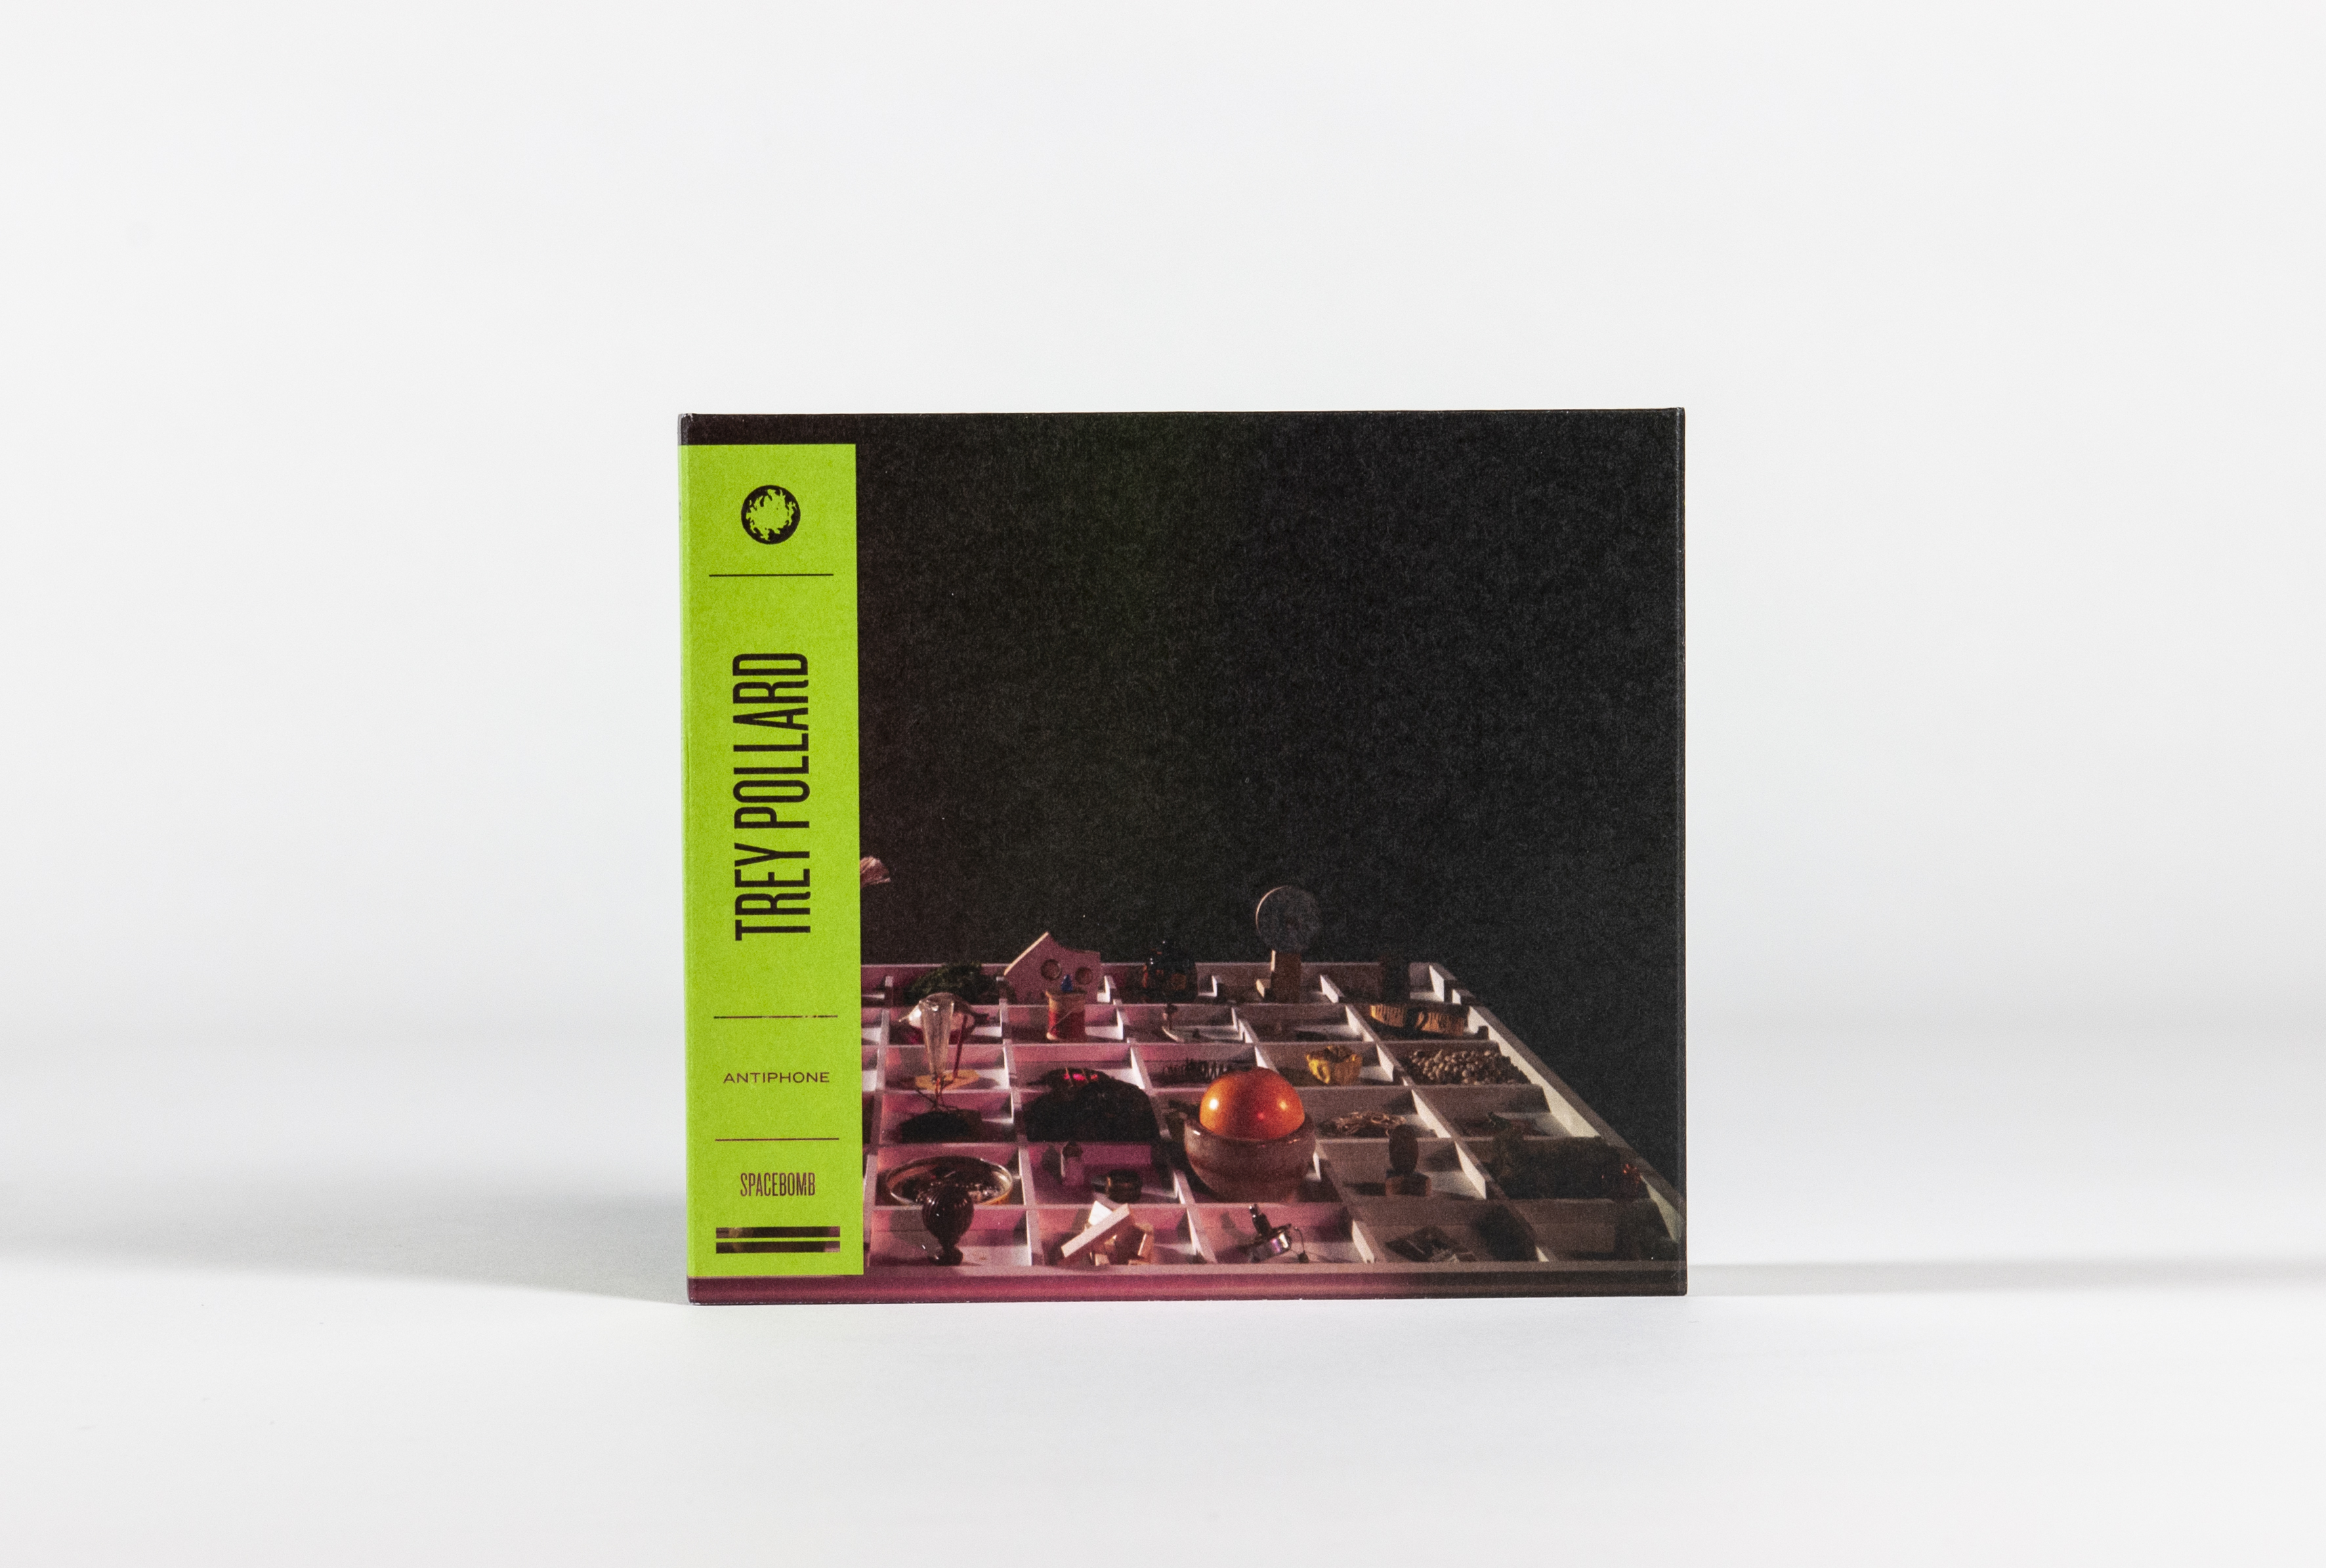 Trey Pollard – 'Antiphone' – CD - Spacebomb Records